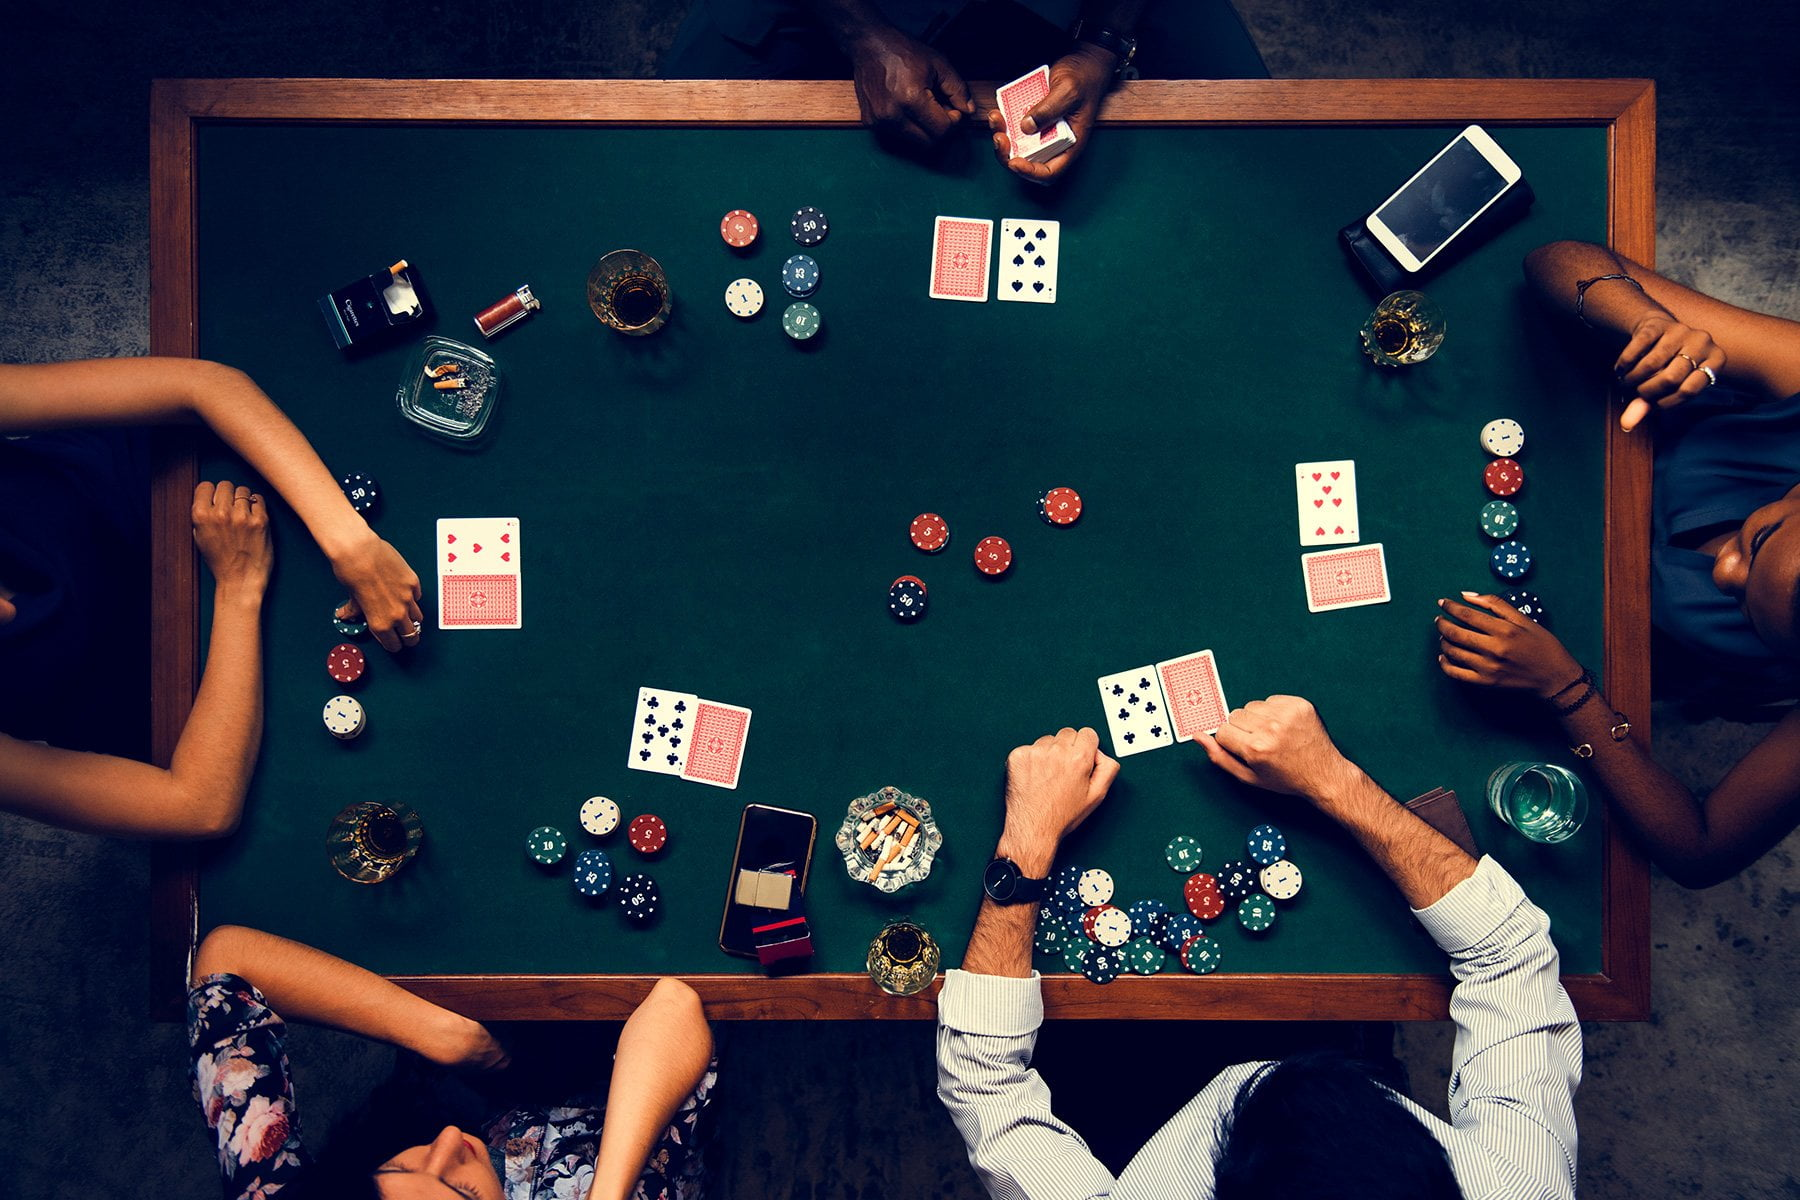 Legalisation of Texas Casino Gaming At Hand As Billionaire Renews Interest